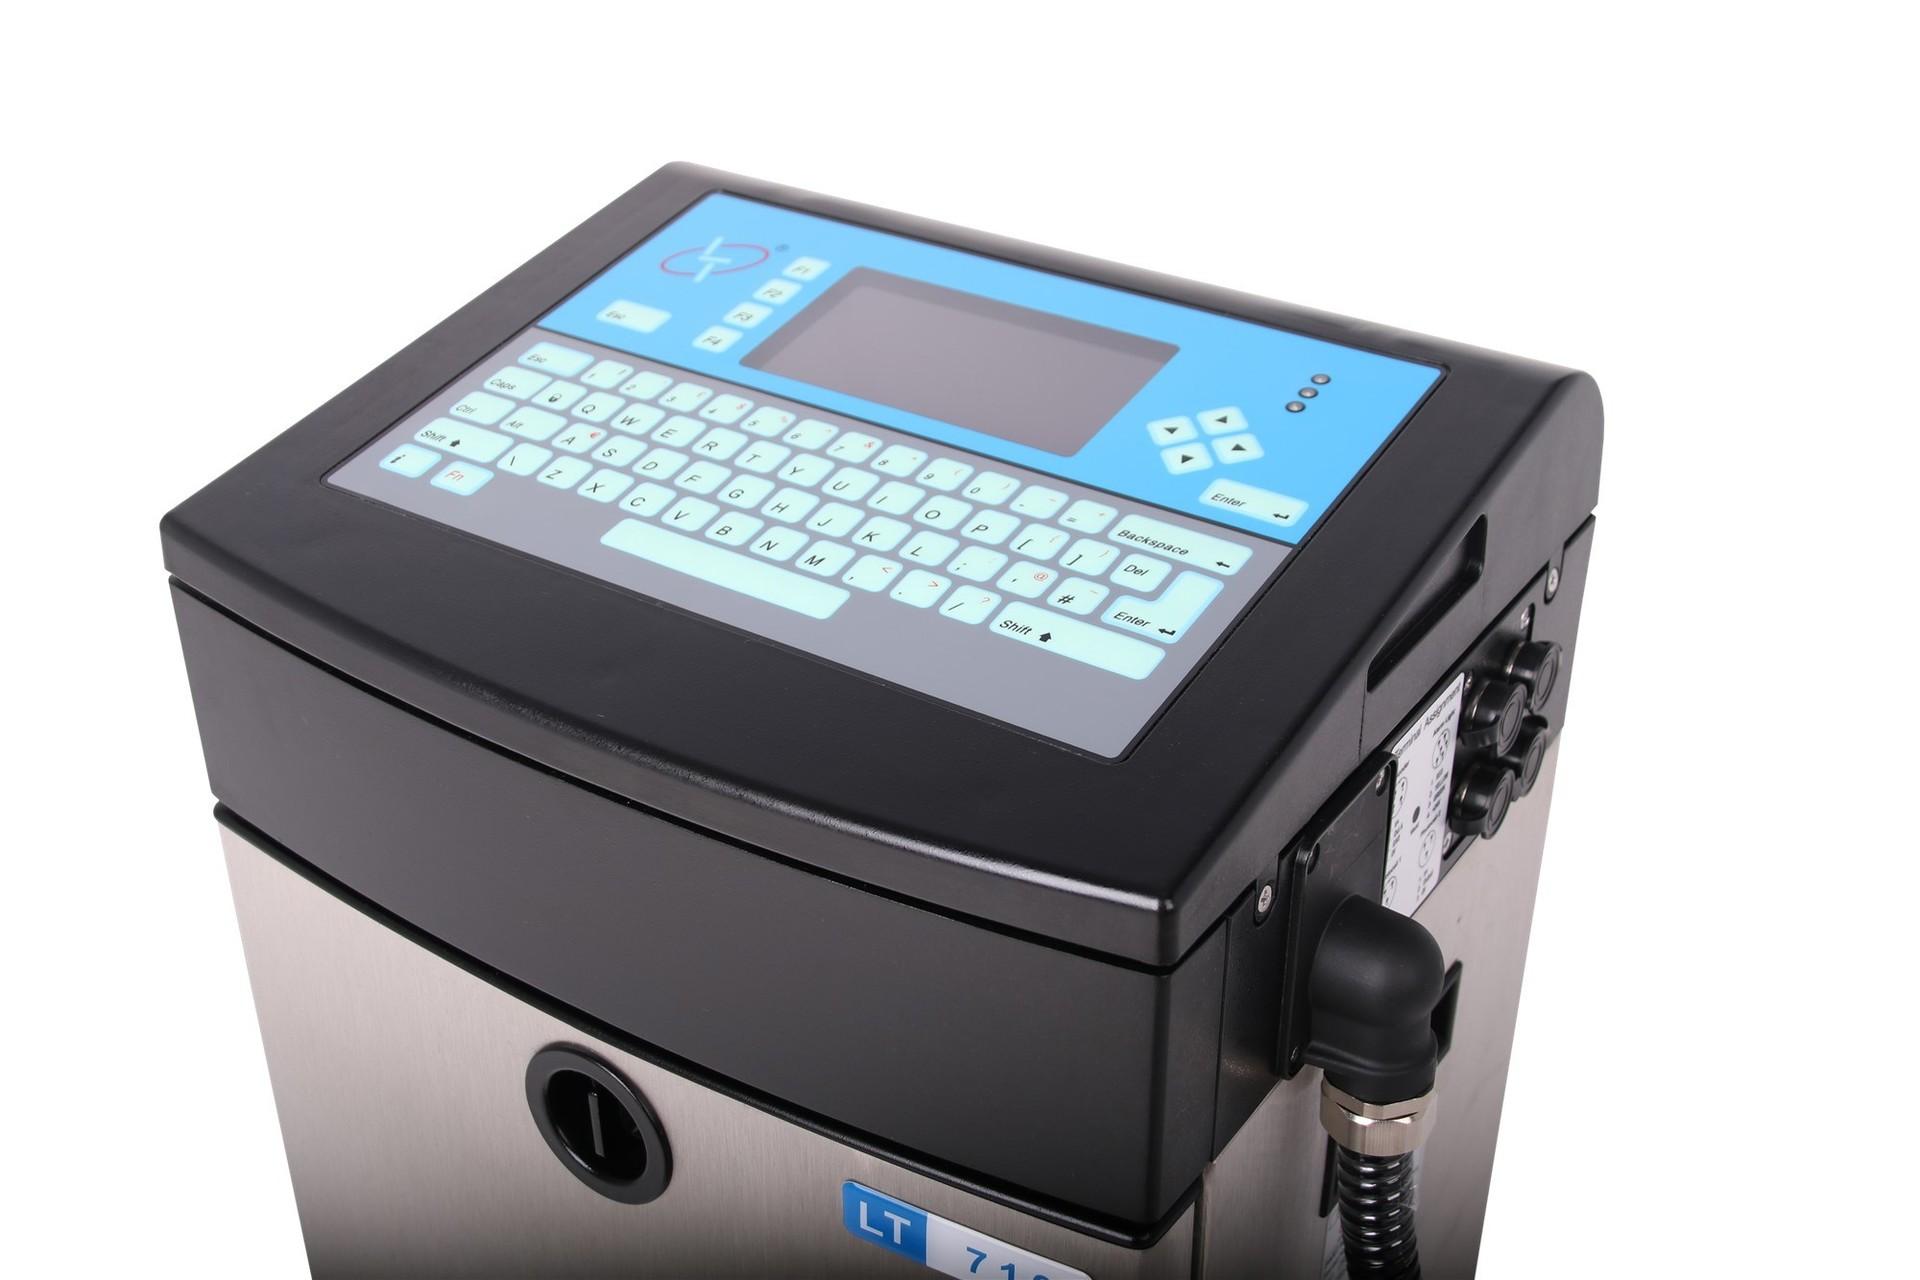 Lead Tech Lt710 Cij Inkjet Printer for Tuna Can Coding